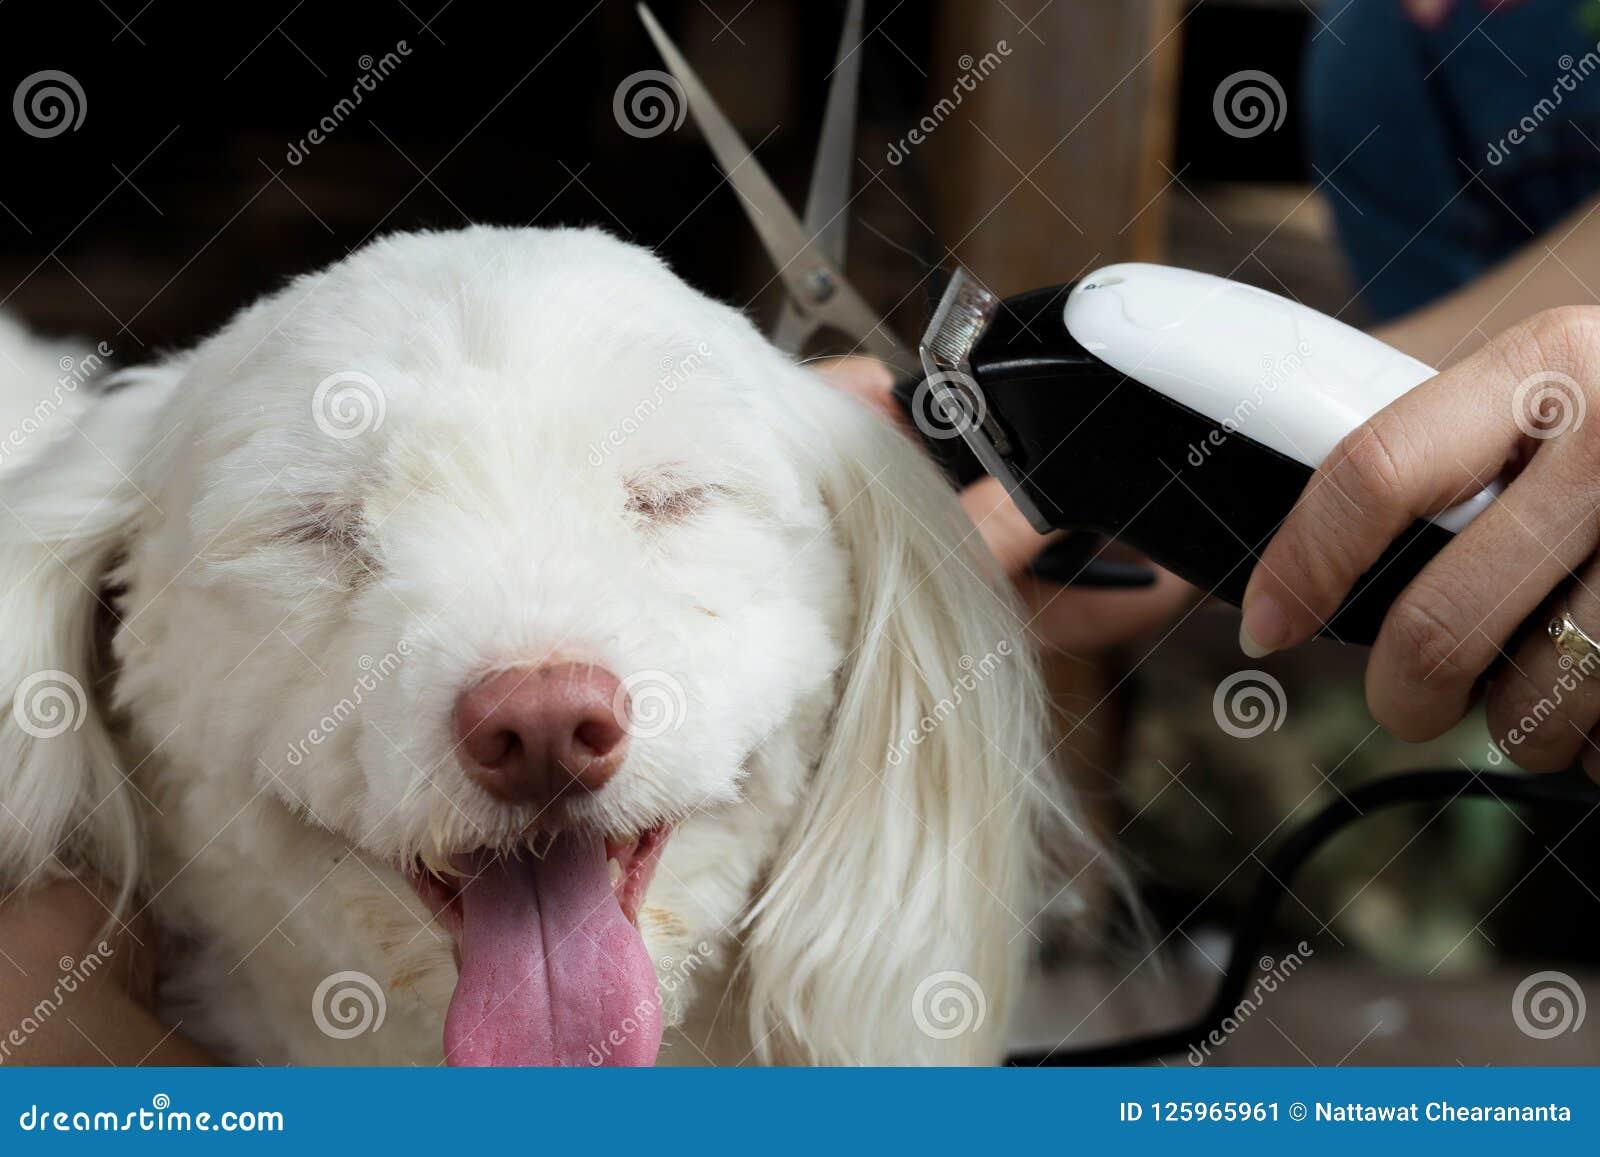 Groomer Cutting Hair Of Small White Dog Scissors Stock Image Image